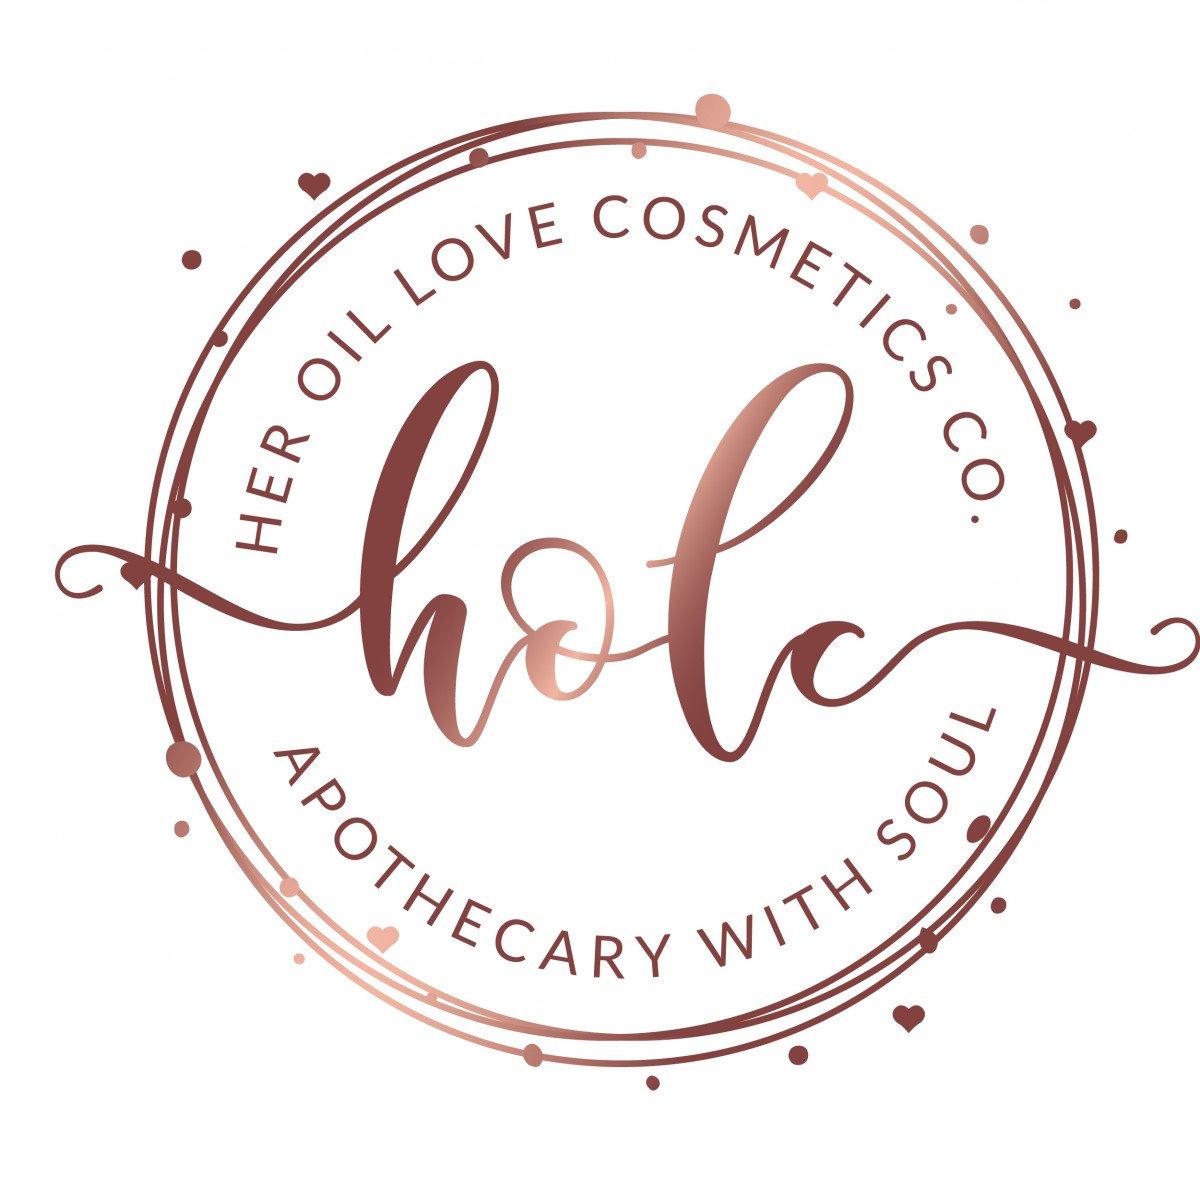 The Origins of Her Oil Love Cosmetics Company